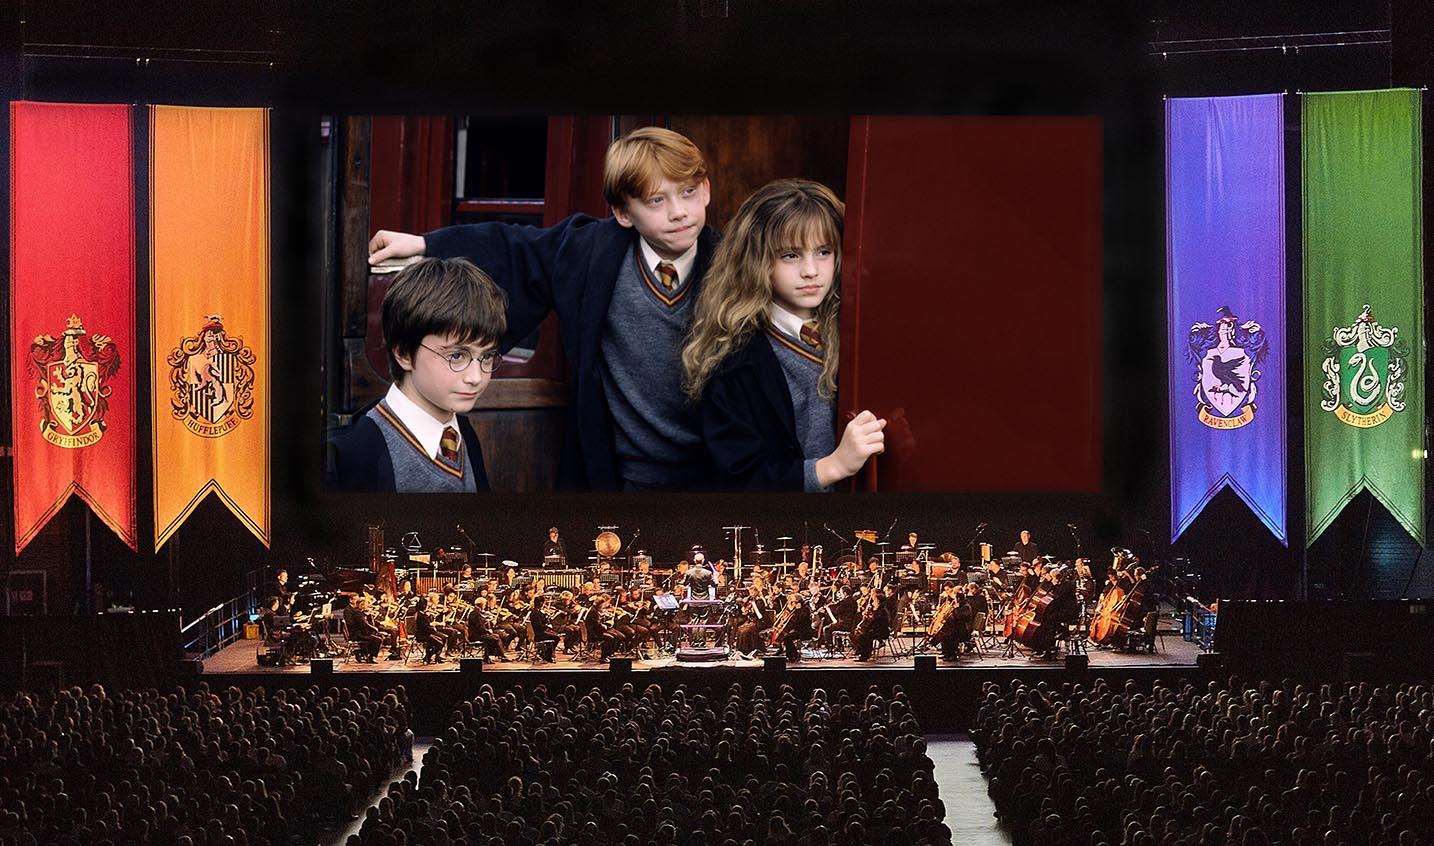 Harry Potter in der Lanxess Arena Köln